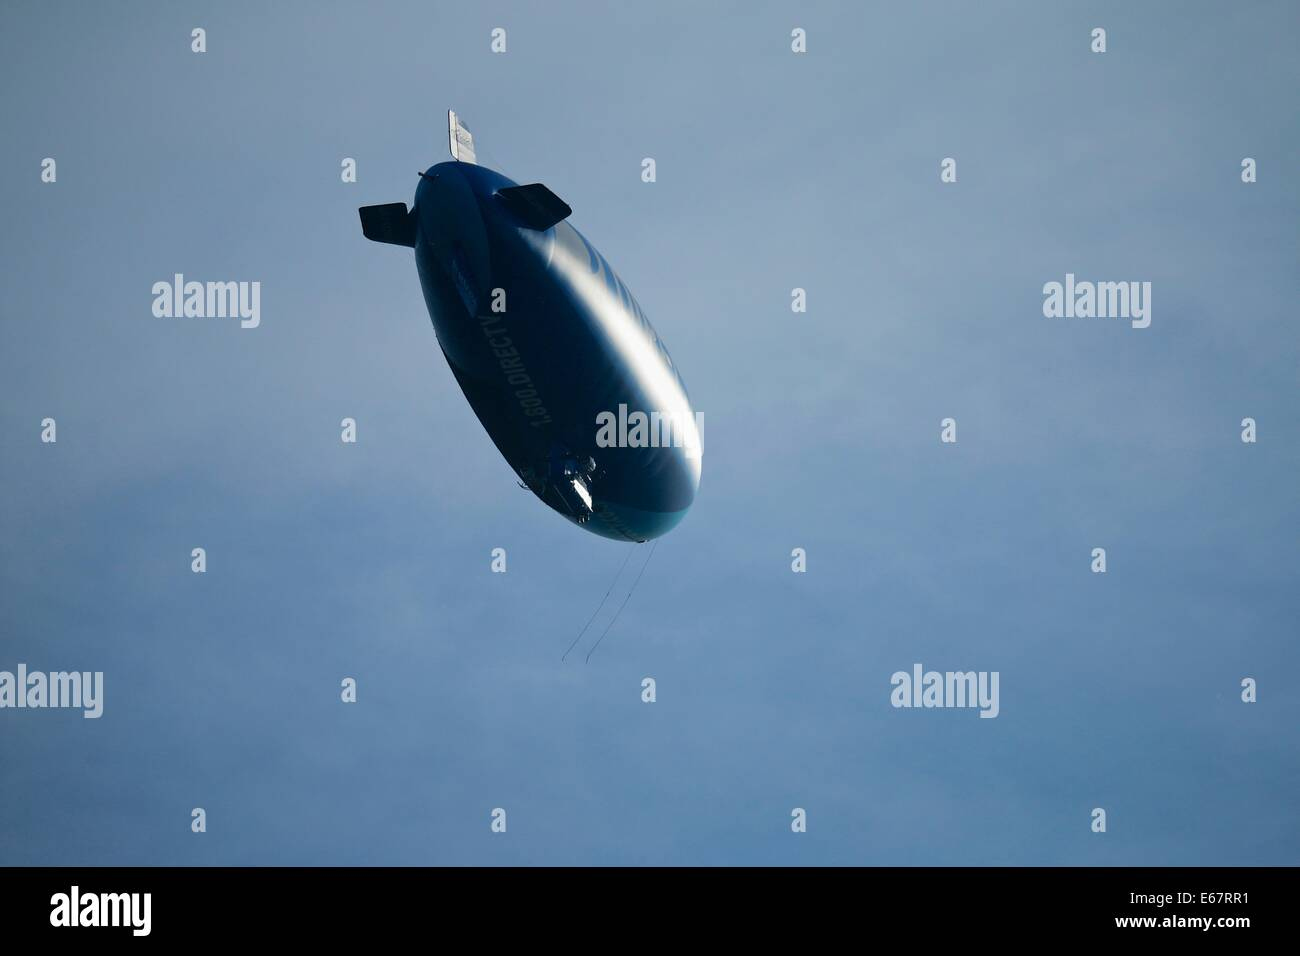 Blimp, airship. - Stock Image